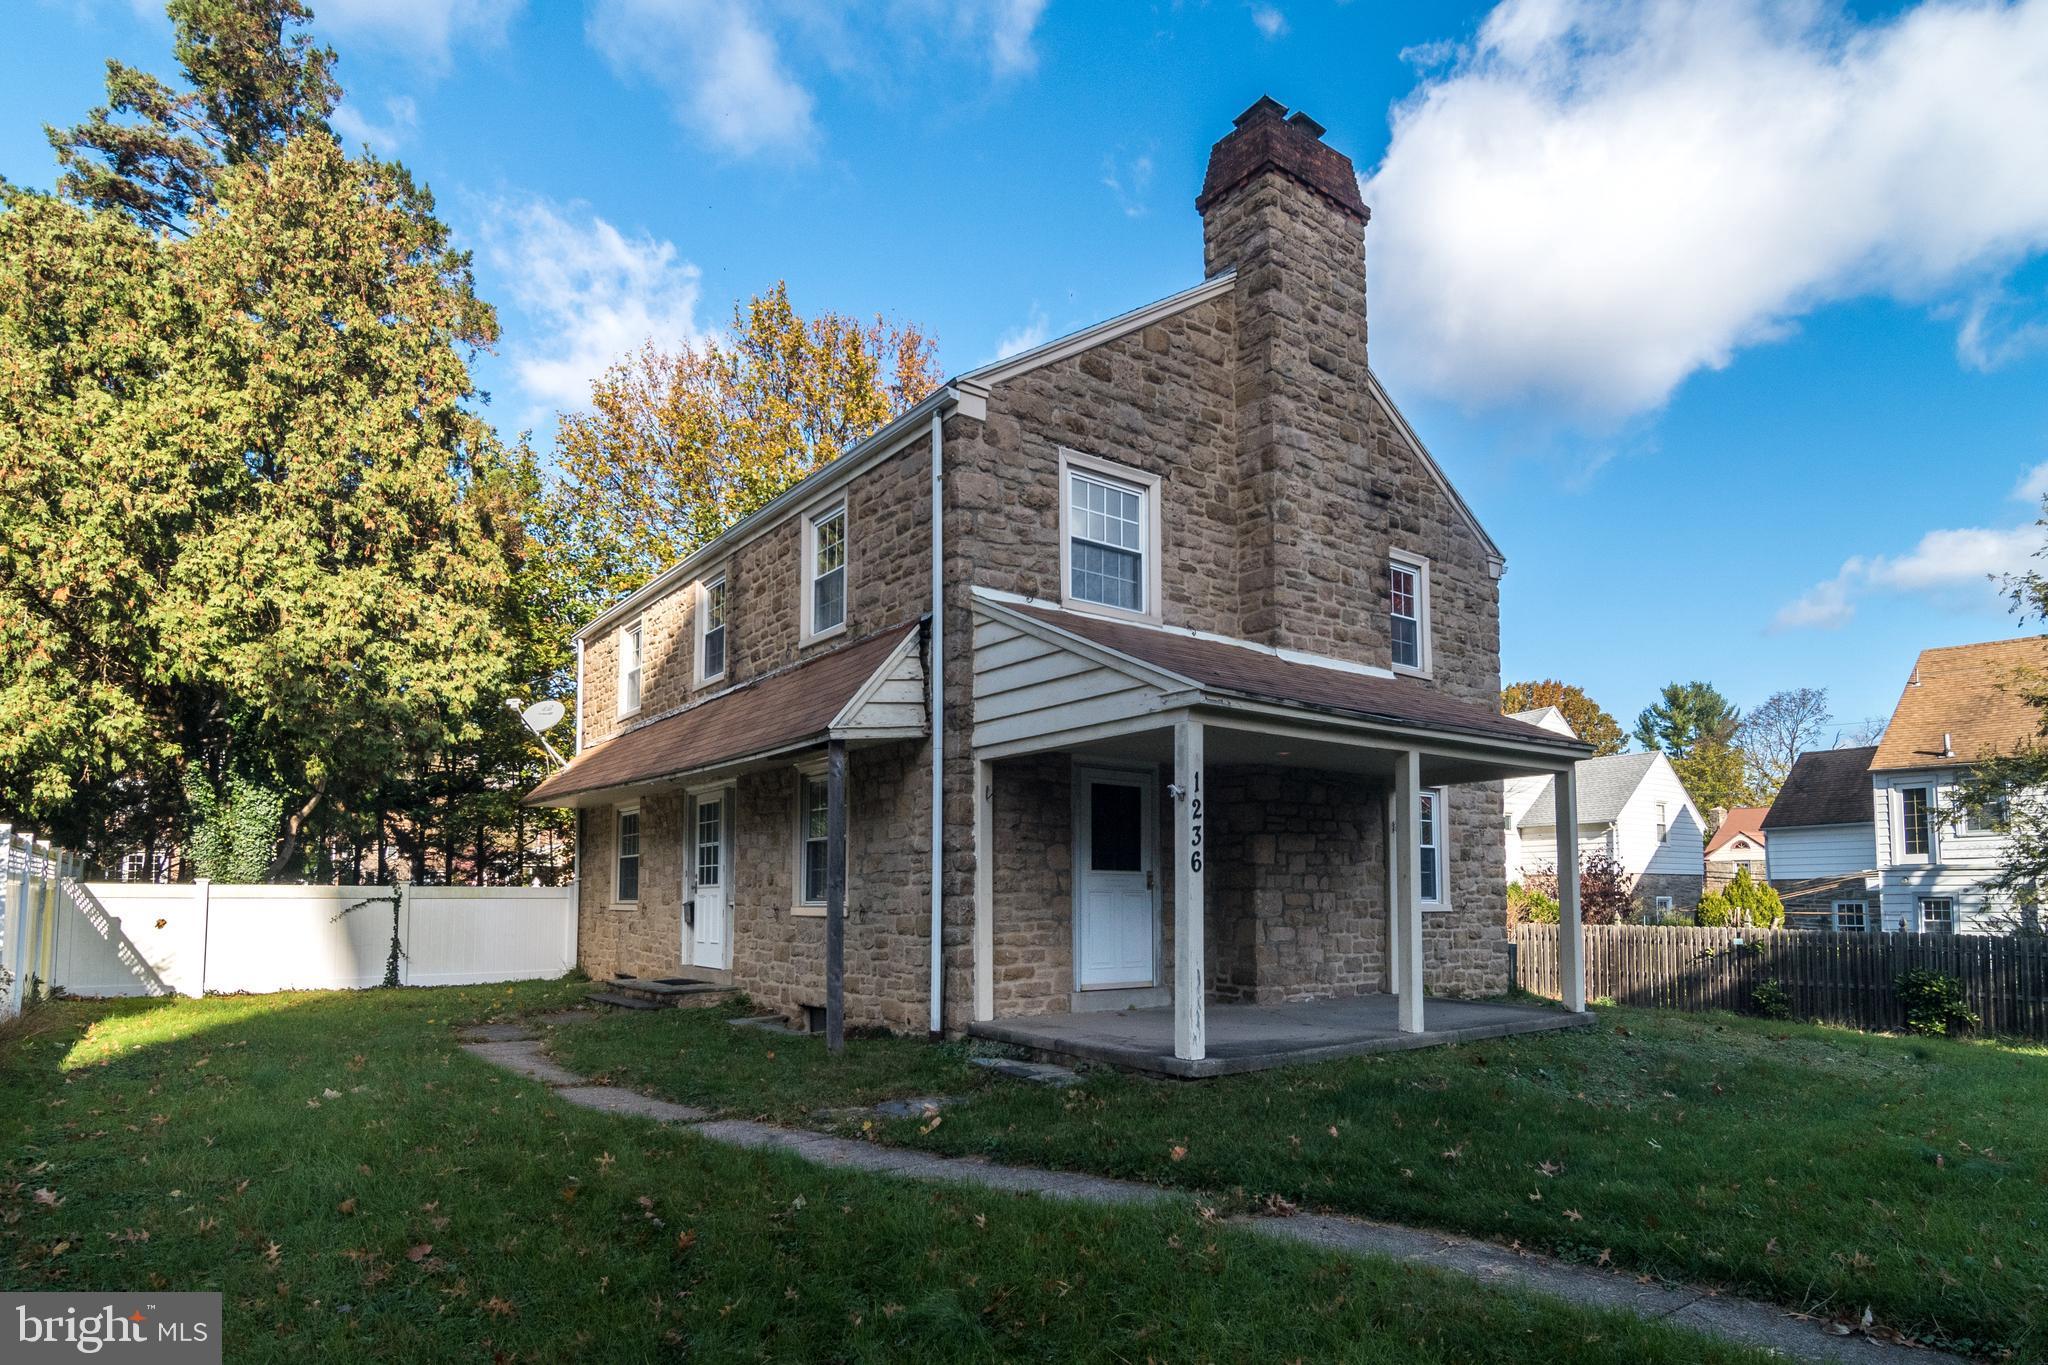 1236 HIGHLAND AVENUE, ABINGTON, PA 19001